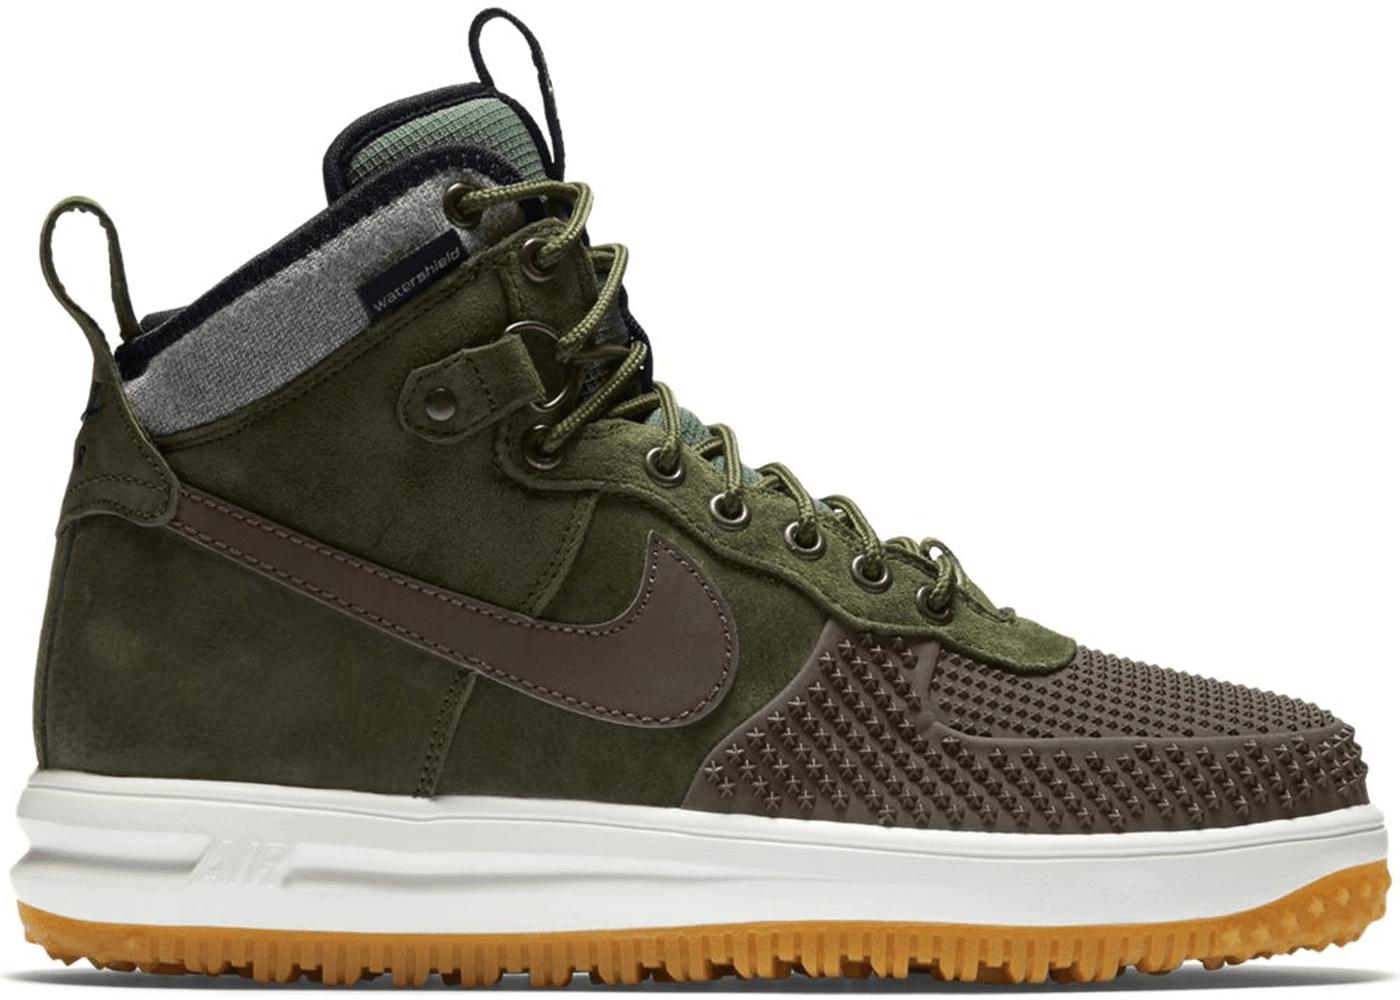 Sepatu naiki Nike Lunar Force 1 Duckboot